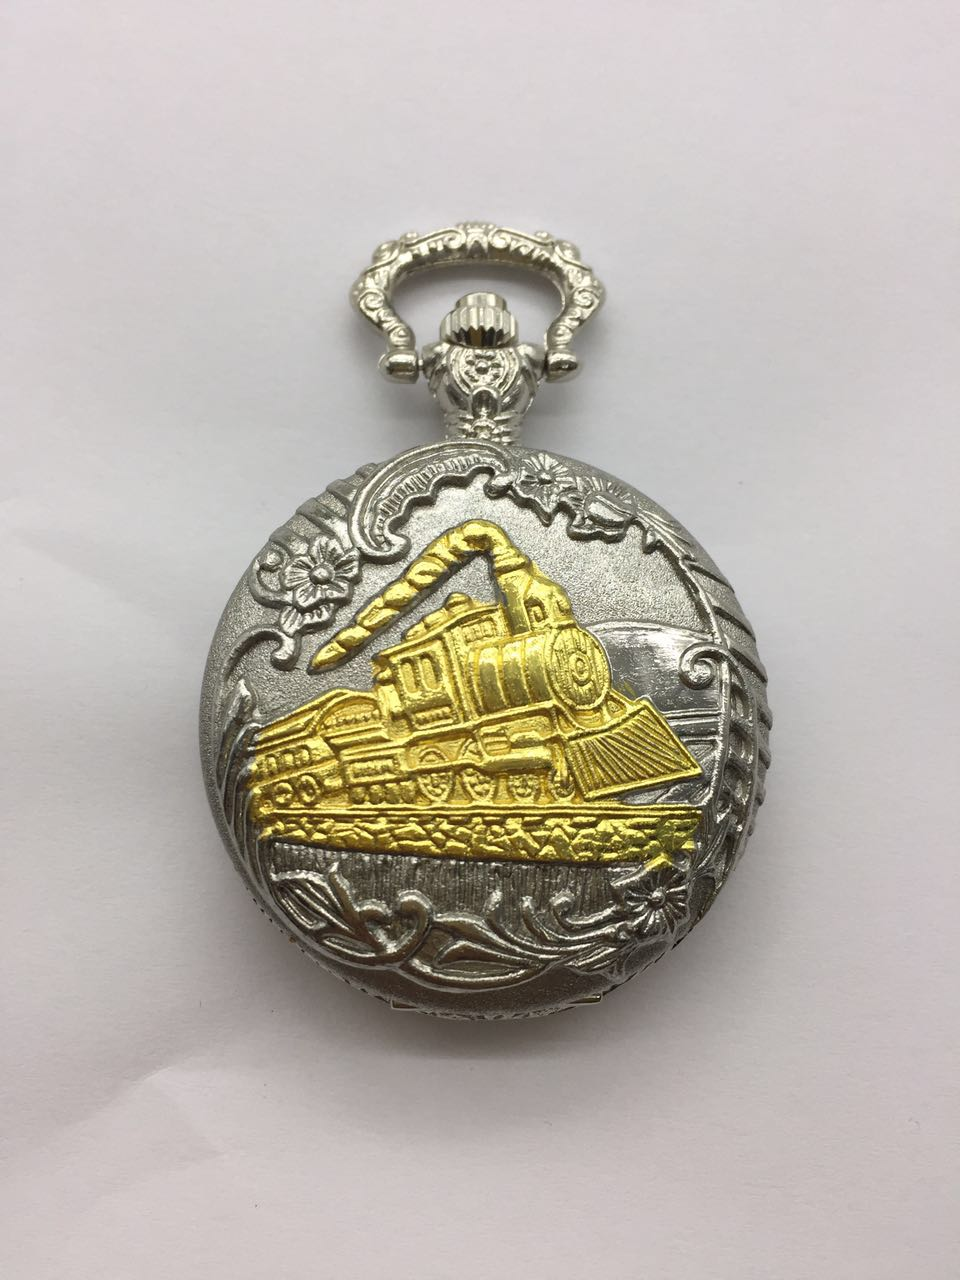 Reloj de bolsillo de cuarzo Steampunk tallado con tren de oro encantador de plata Vintage